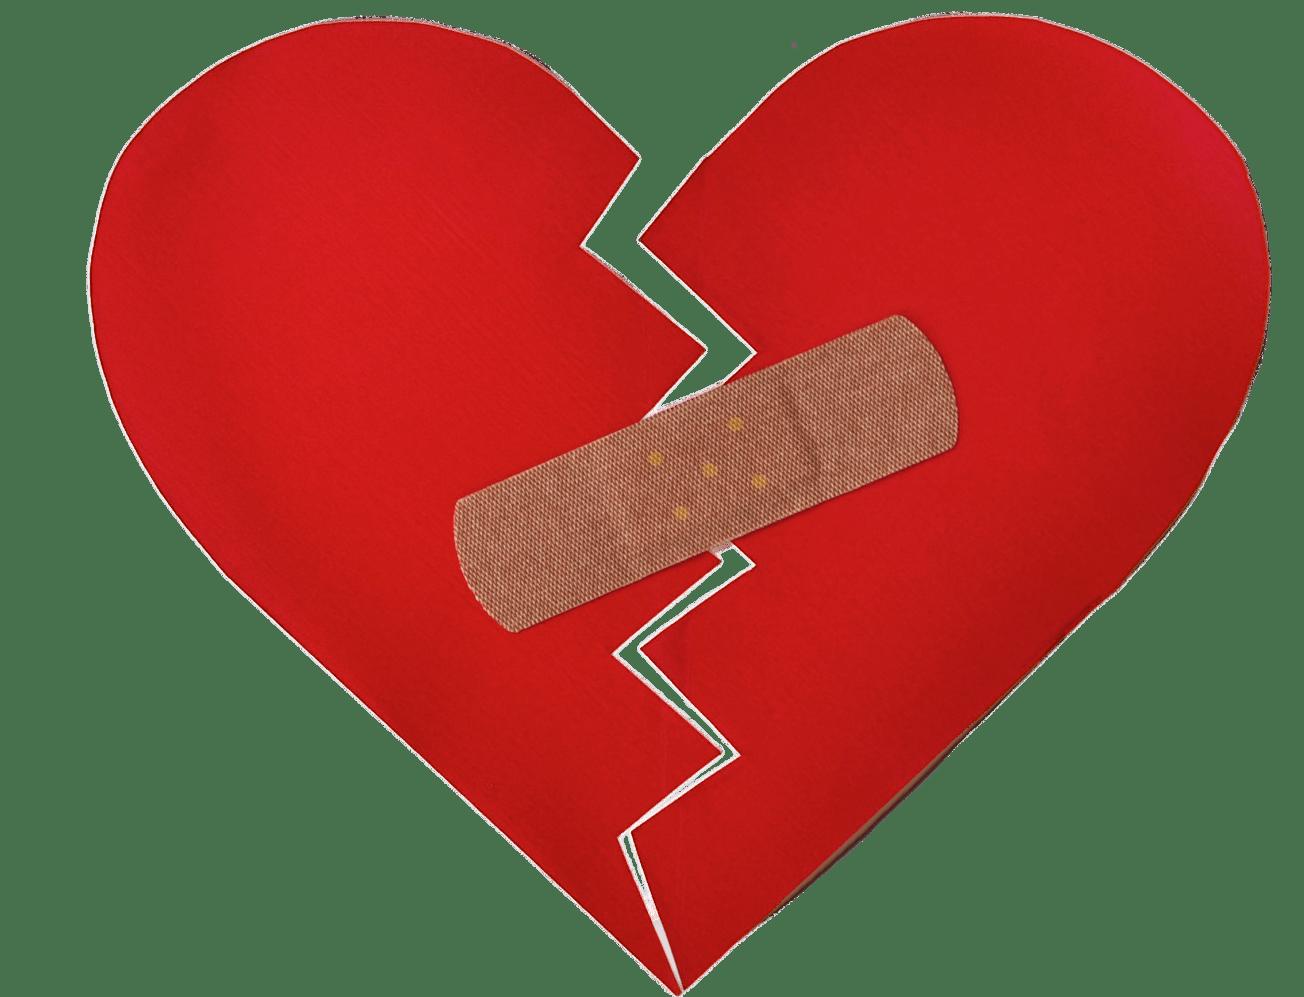 Broken heart clipart transparent graphic transparent library Broken Heart With Bandaid transparent PNG - StickPNG graphic transparent library